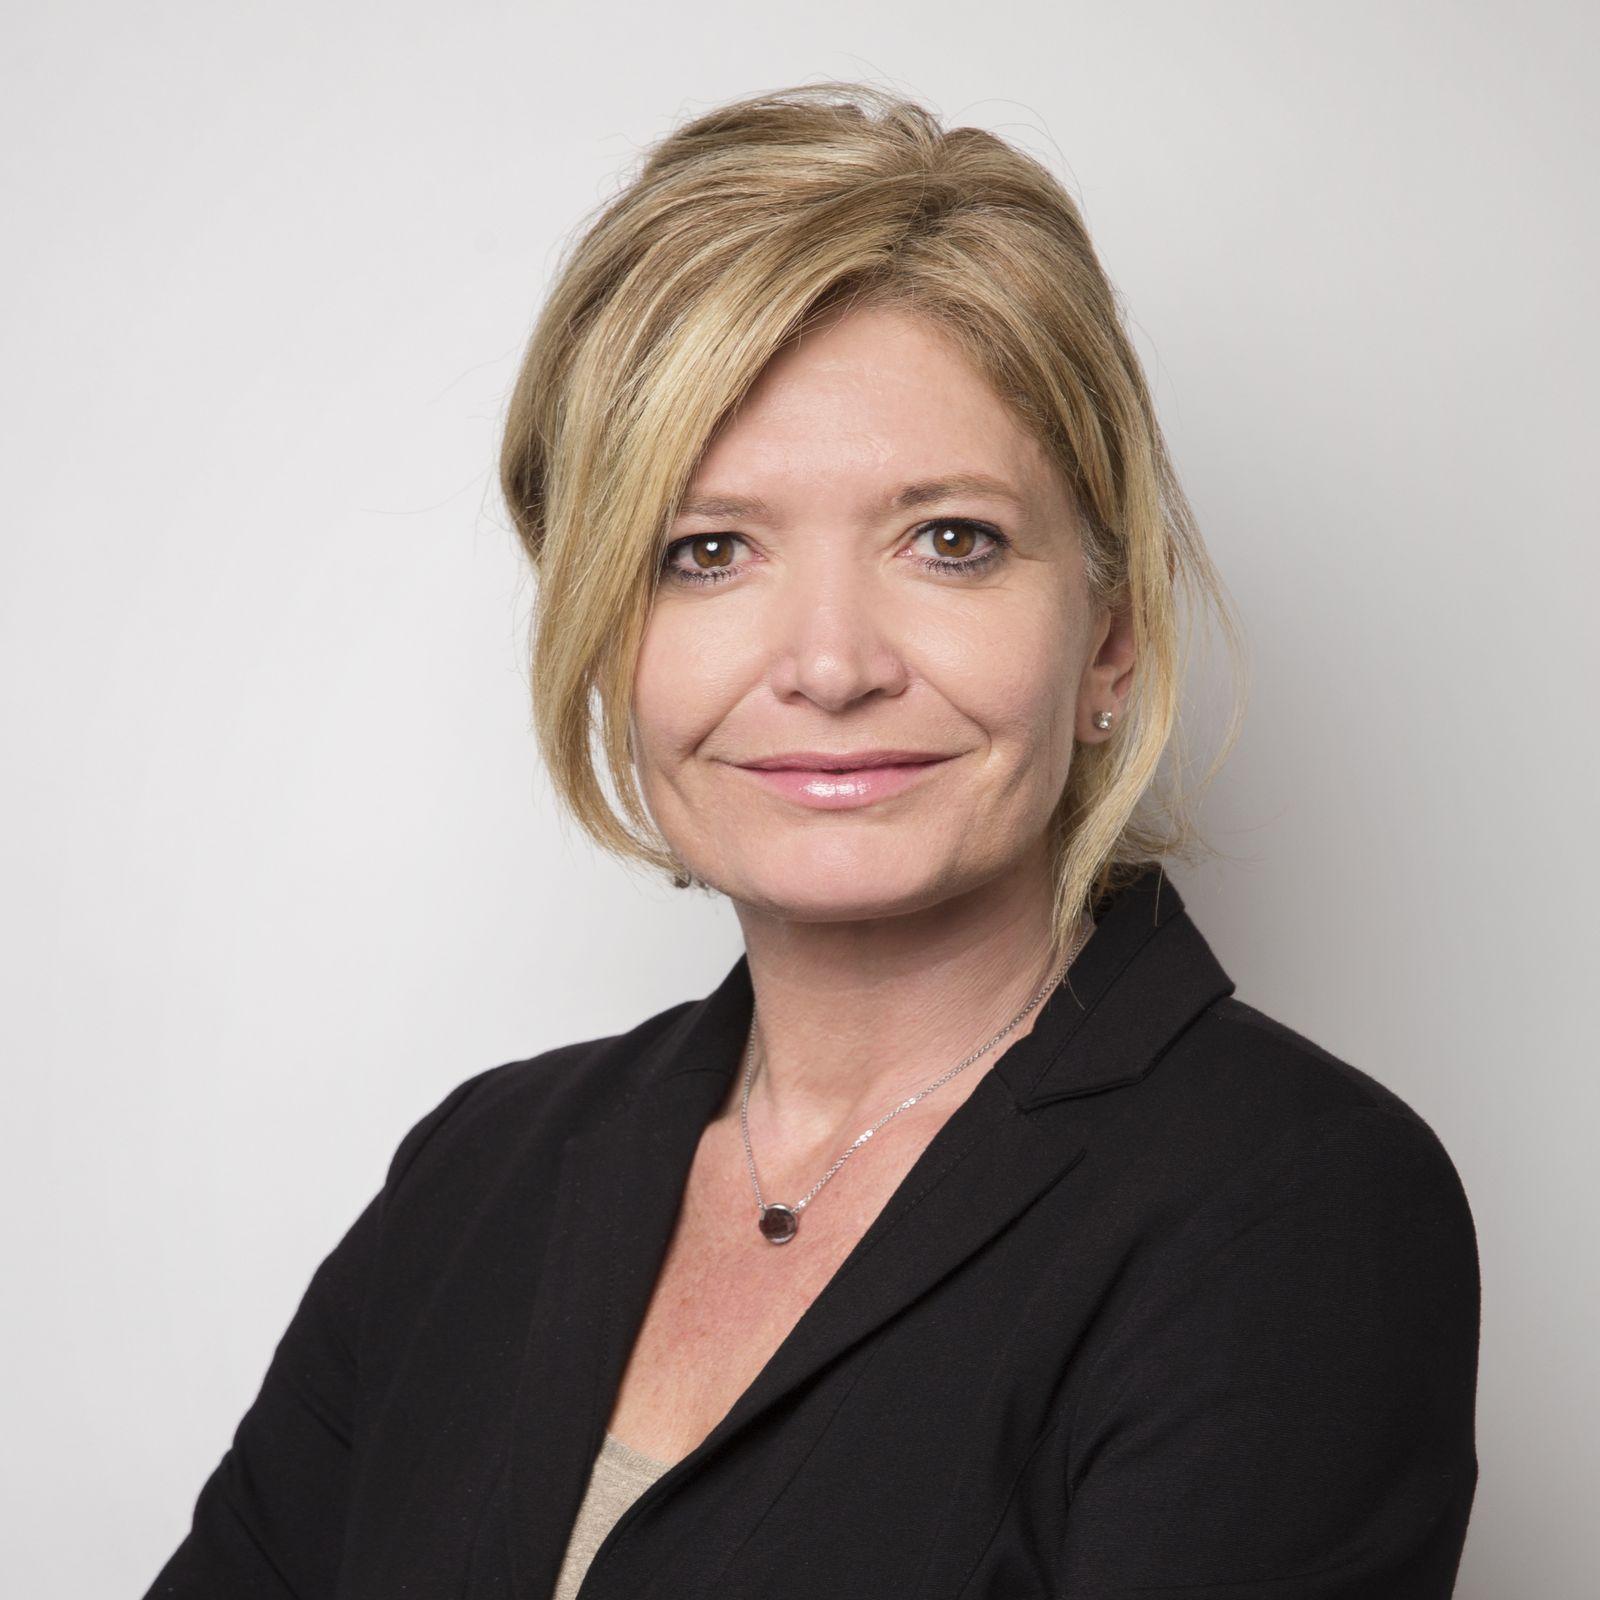 Caroline Haldemann